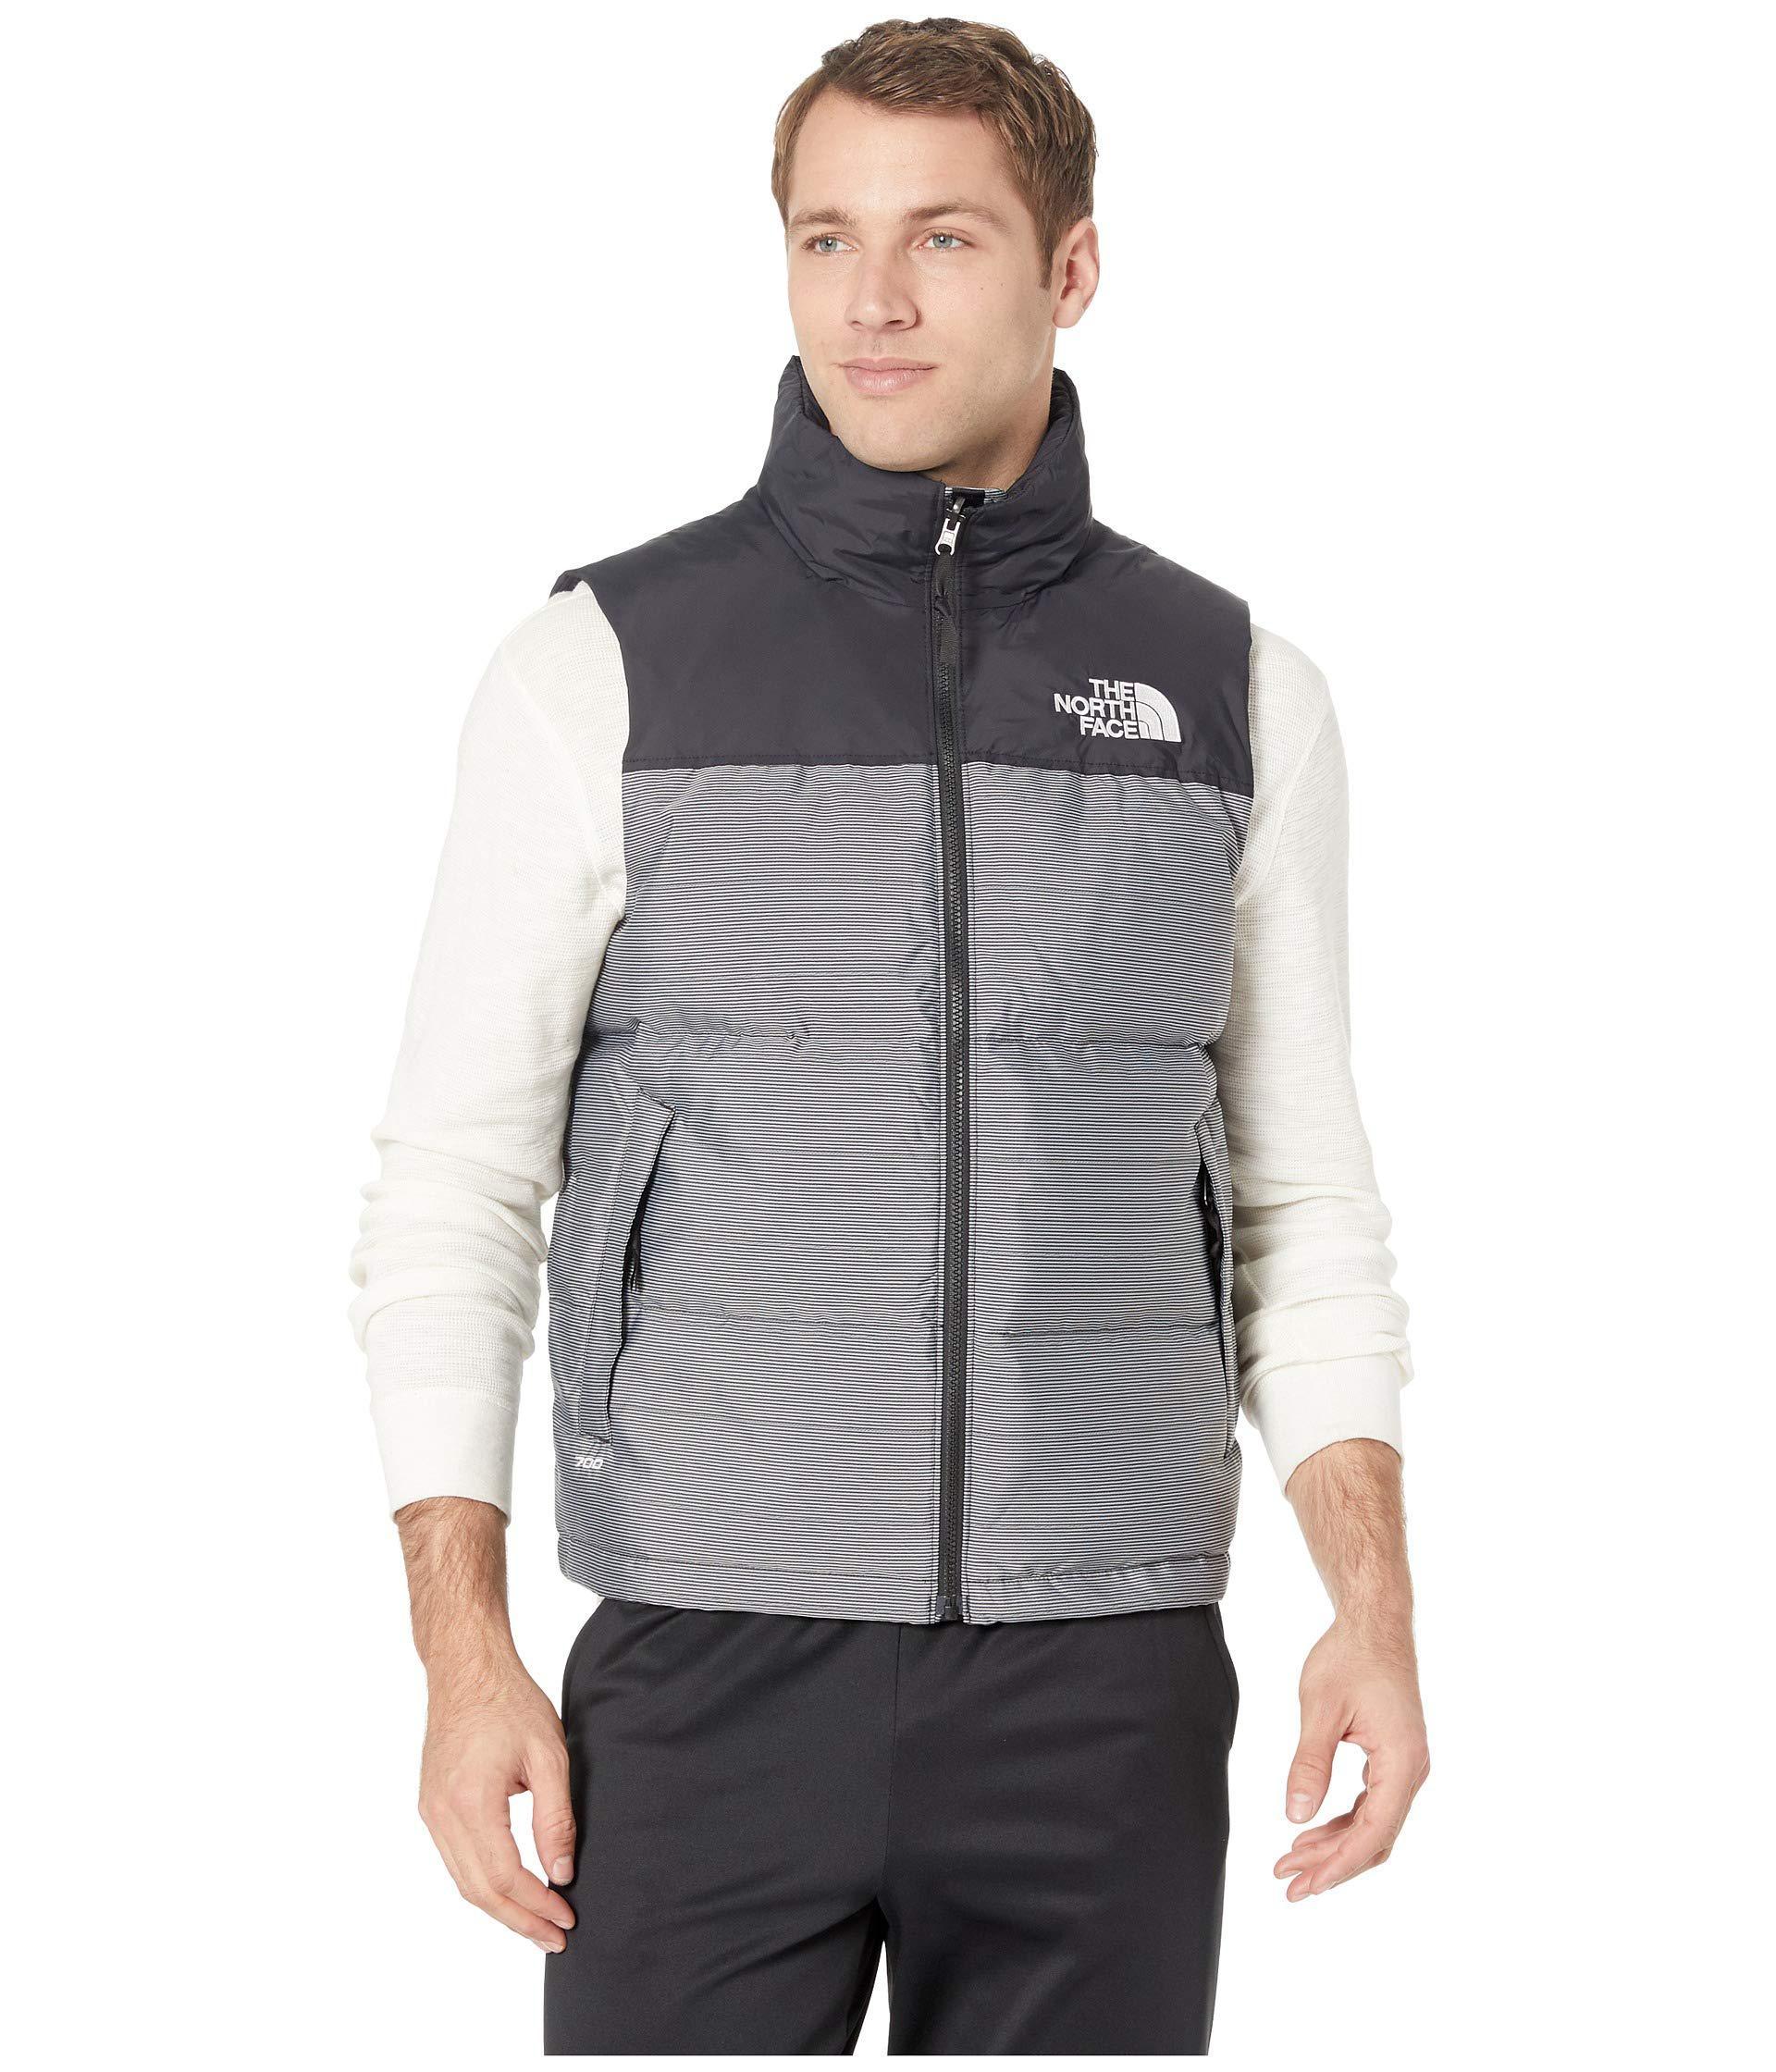 Lyst - The North Face 1996 Retro Novelty Nuptse Vest (tnf Black ... 7f43b6272